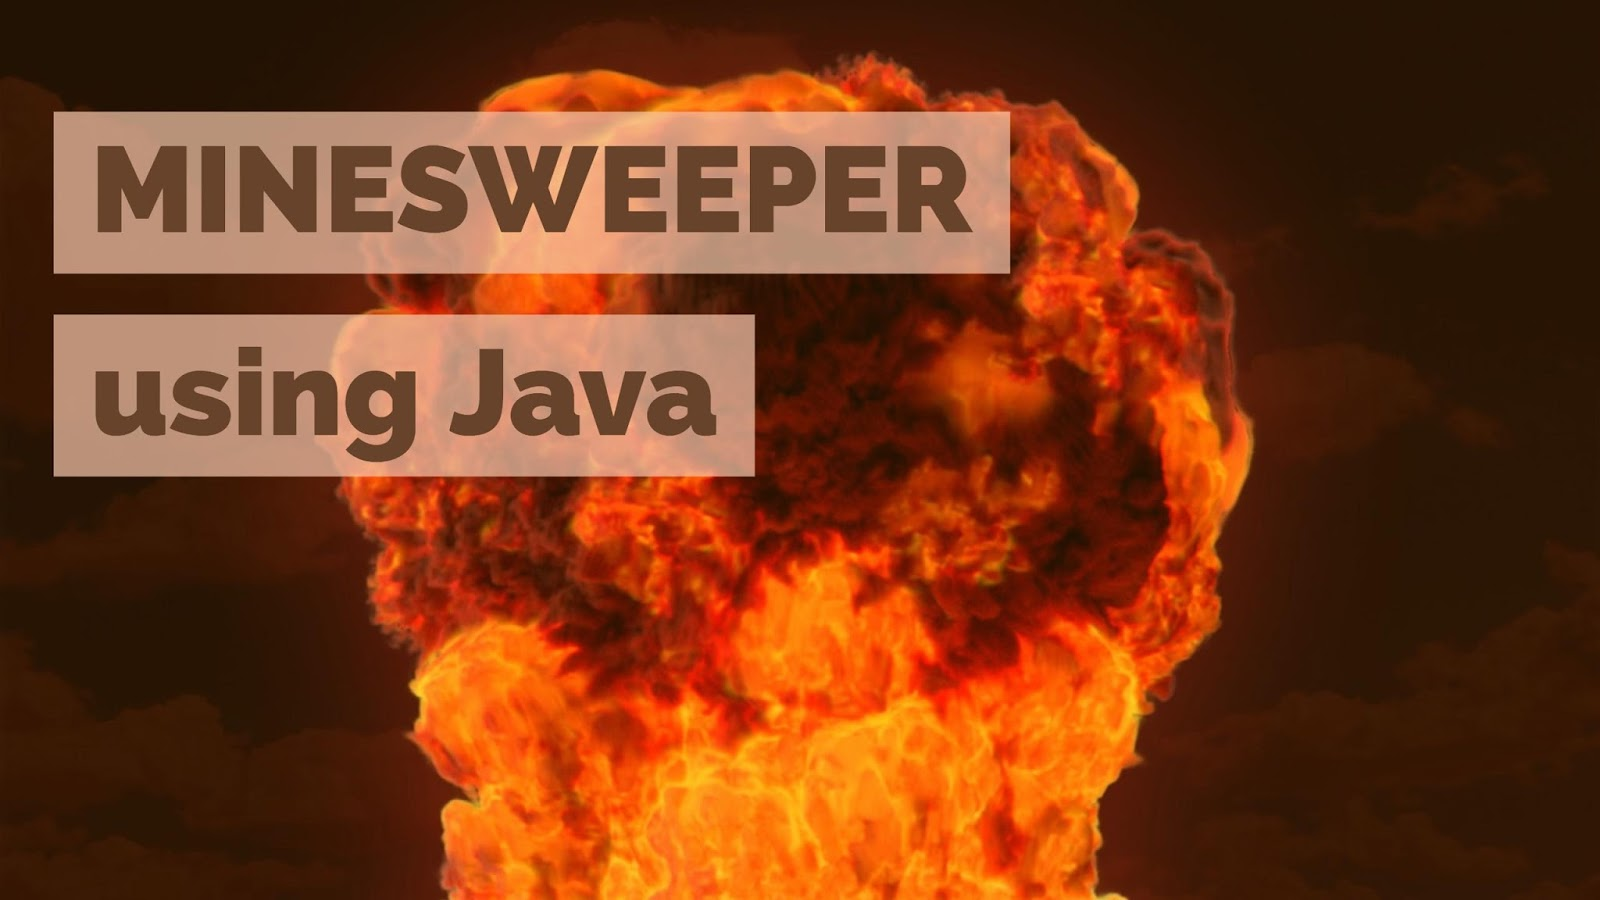 Developing Minesweeper using Java